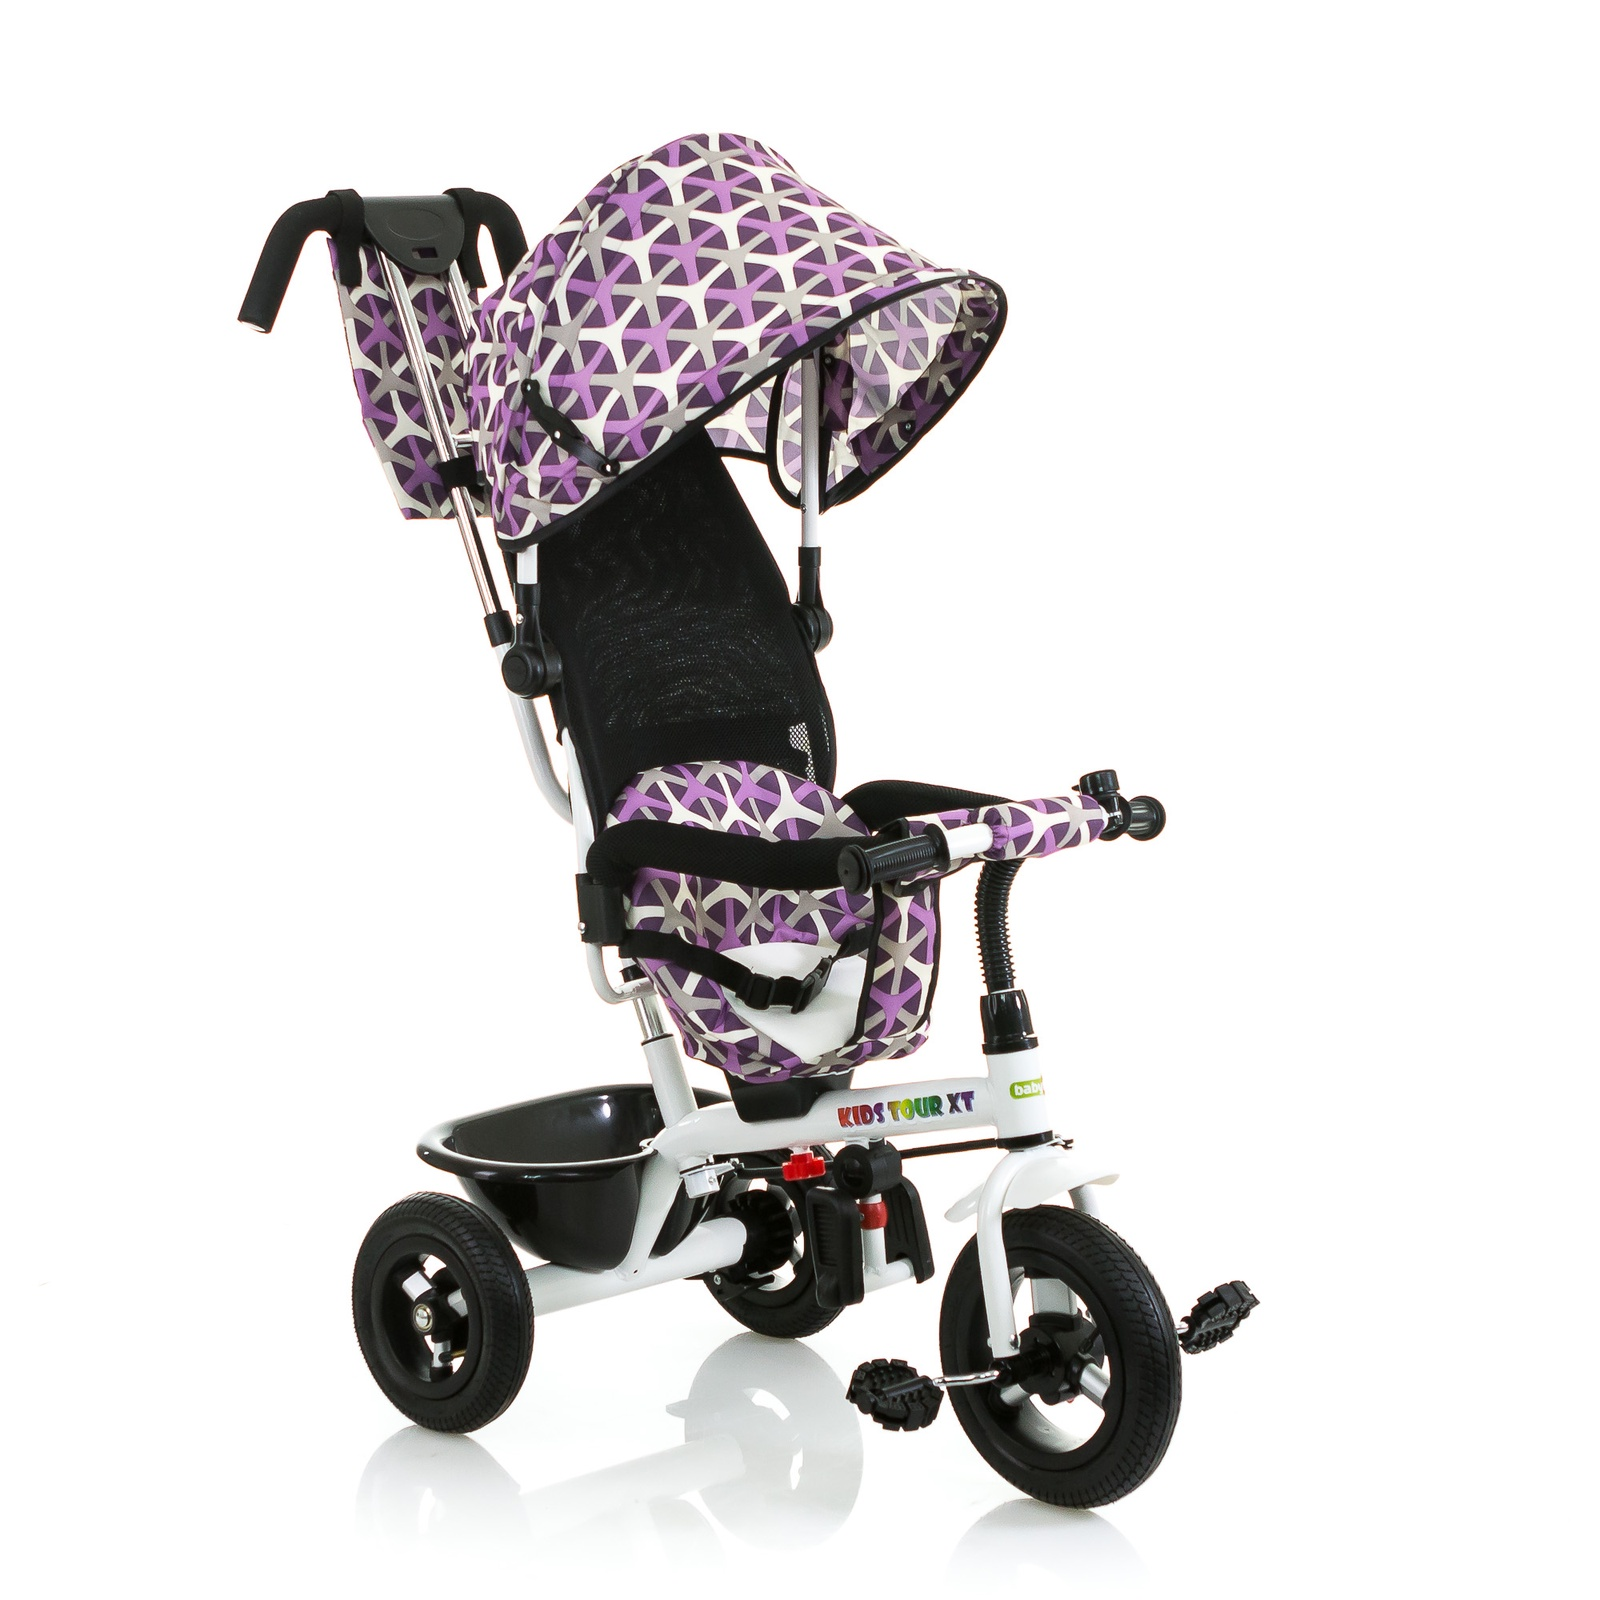 Велосипед BabyHit Kids Tour XT, сиреневый цена